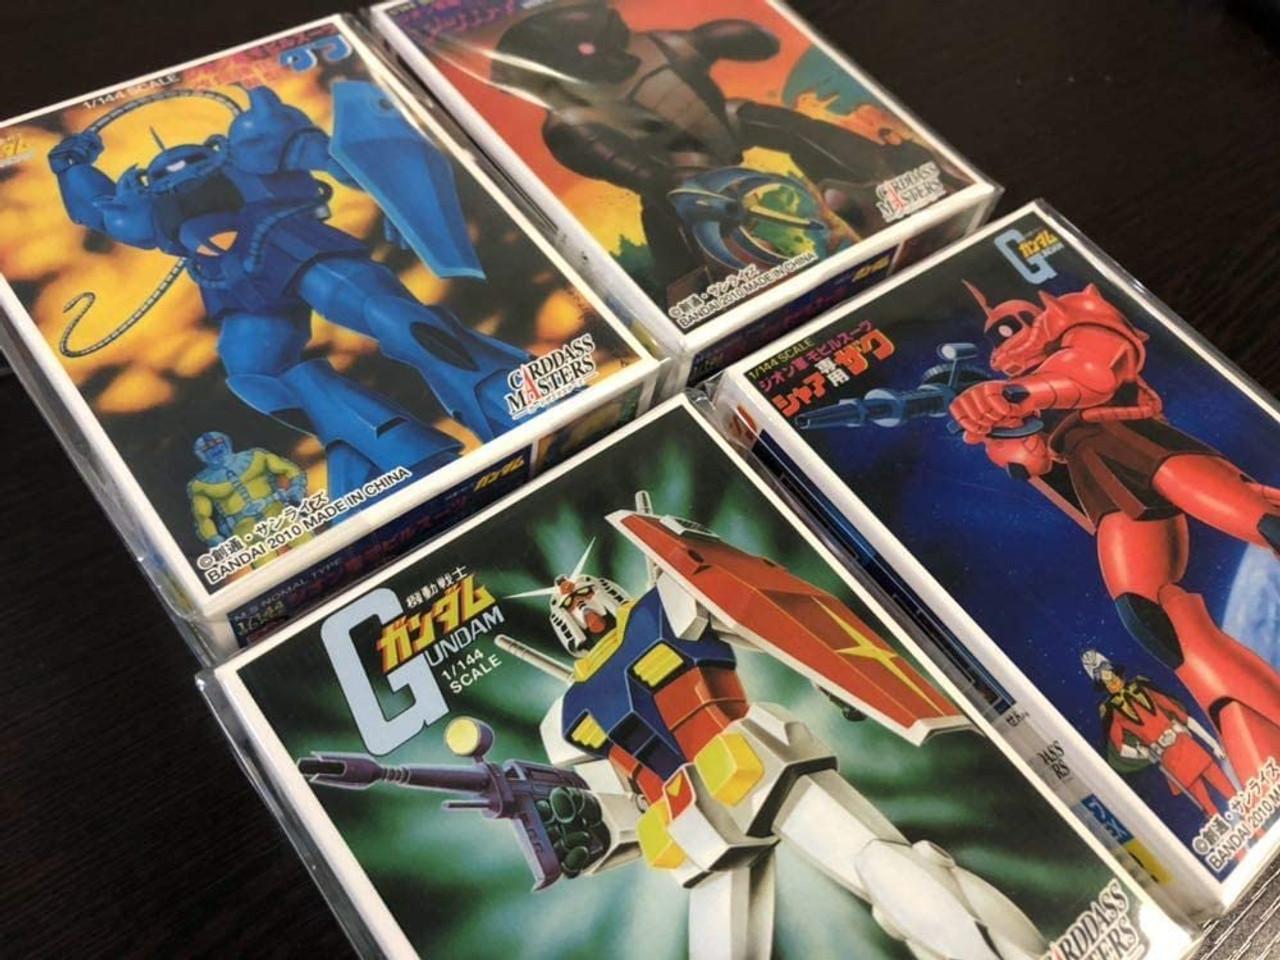 BANDAI Carddass Masters Official Sleeve Collection EX Gunpla Sleeve 4 Types Gundam, Char's Zaku, Gouf, Acguy